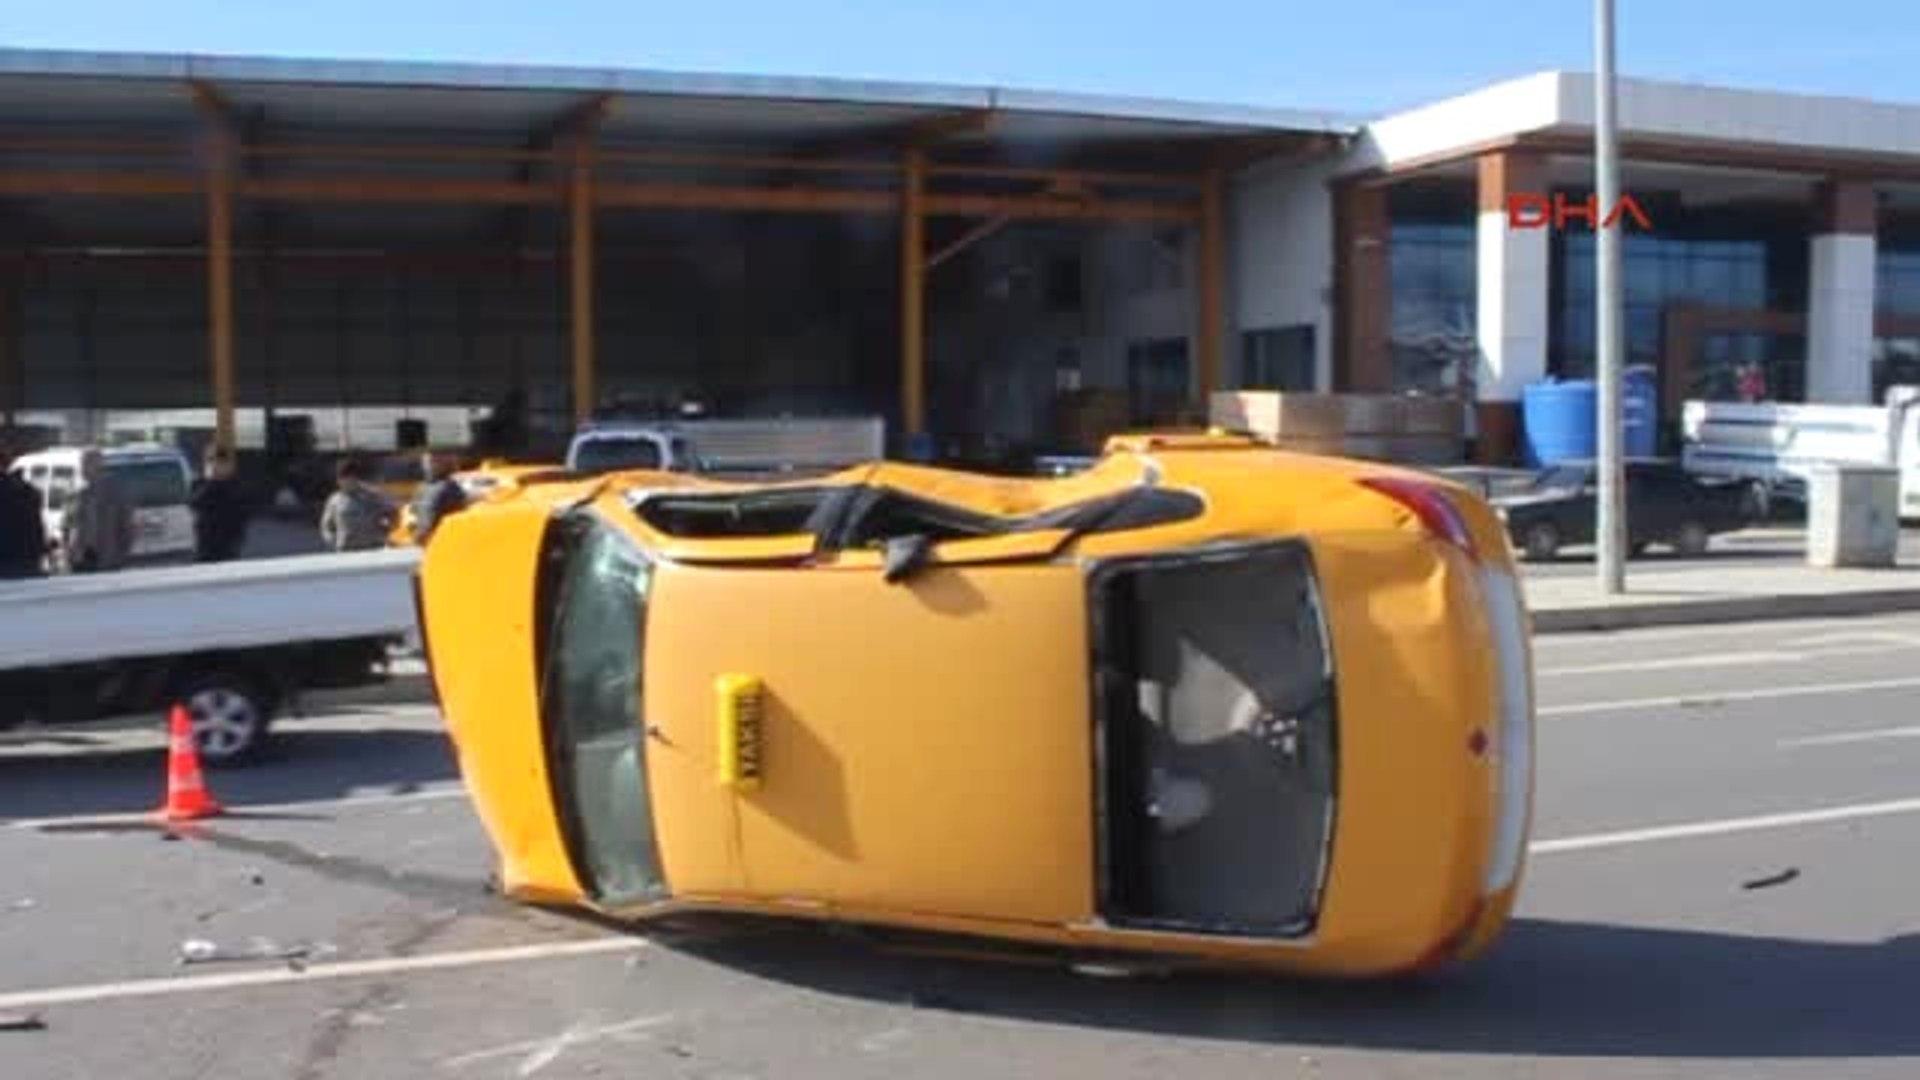 Antalya Taksi Takla Attı 1 Yaralı